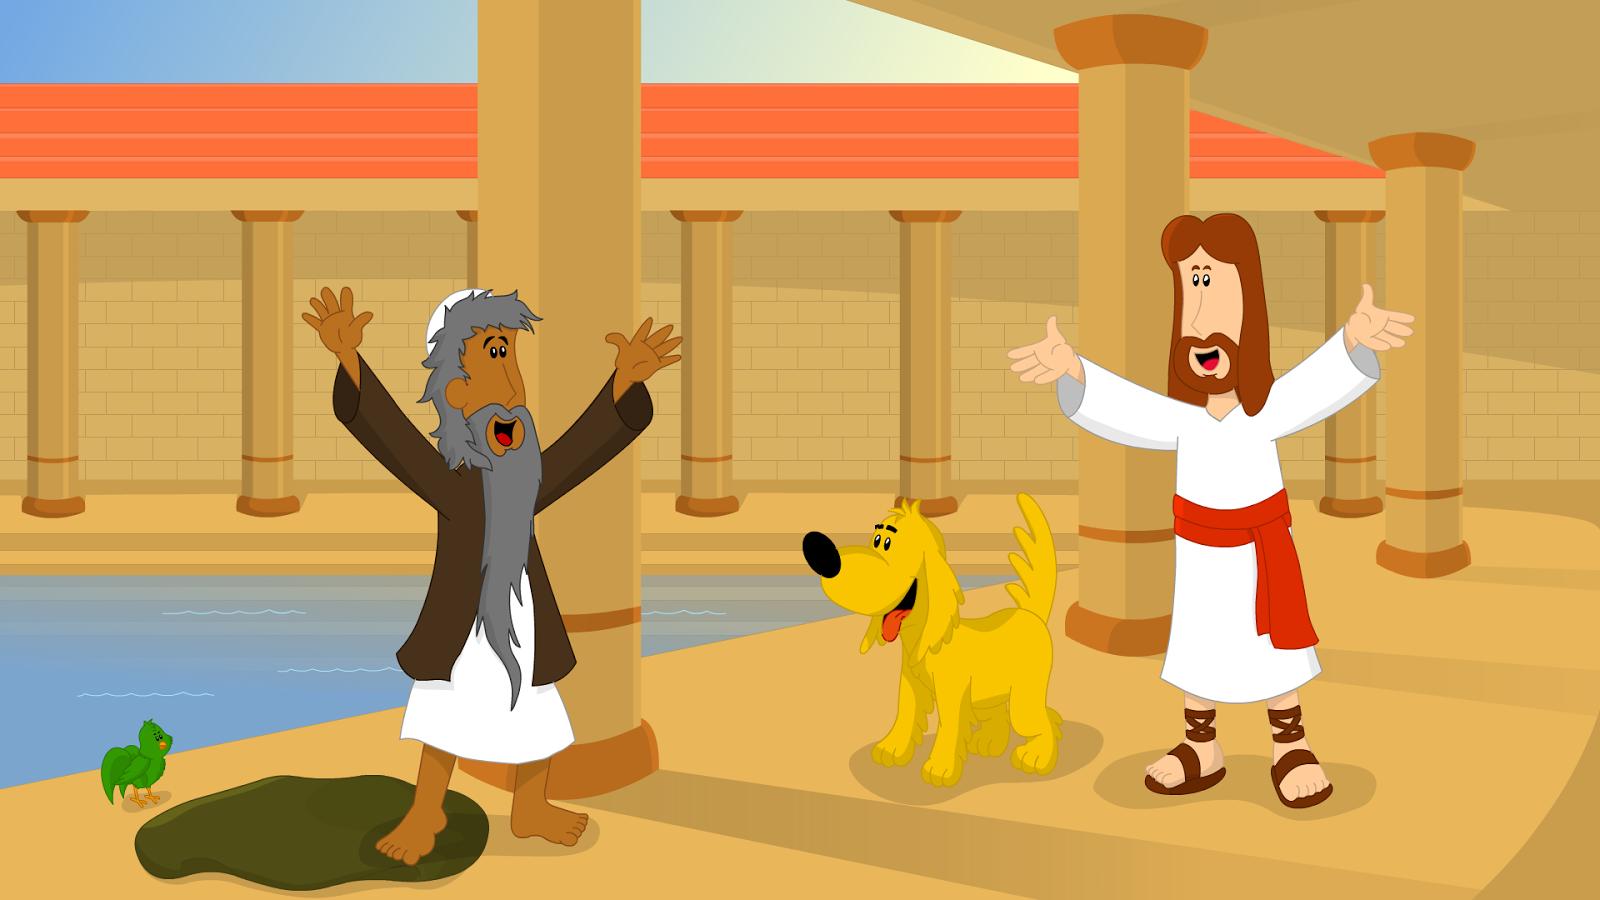 desenho animado os milagres de jesus no tanque de betesda pedro